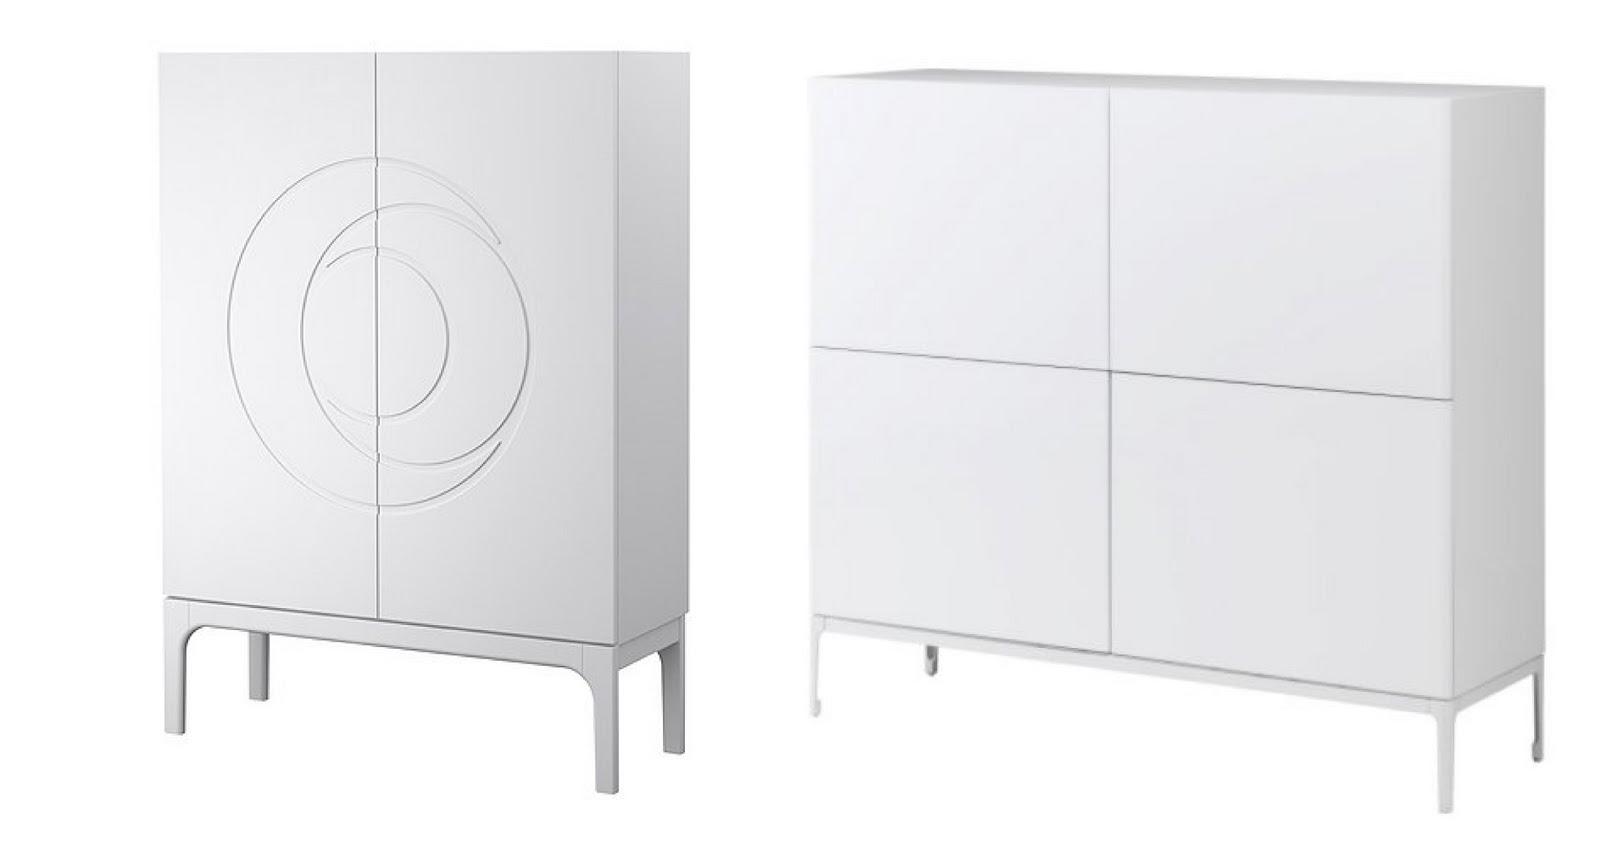 casas cocinas mueble Ikea aparadores